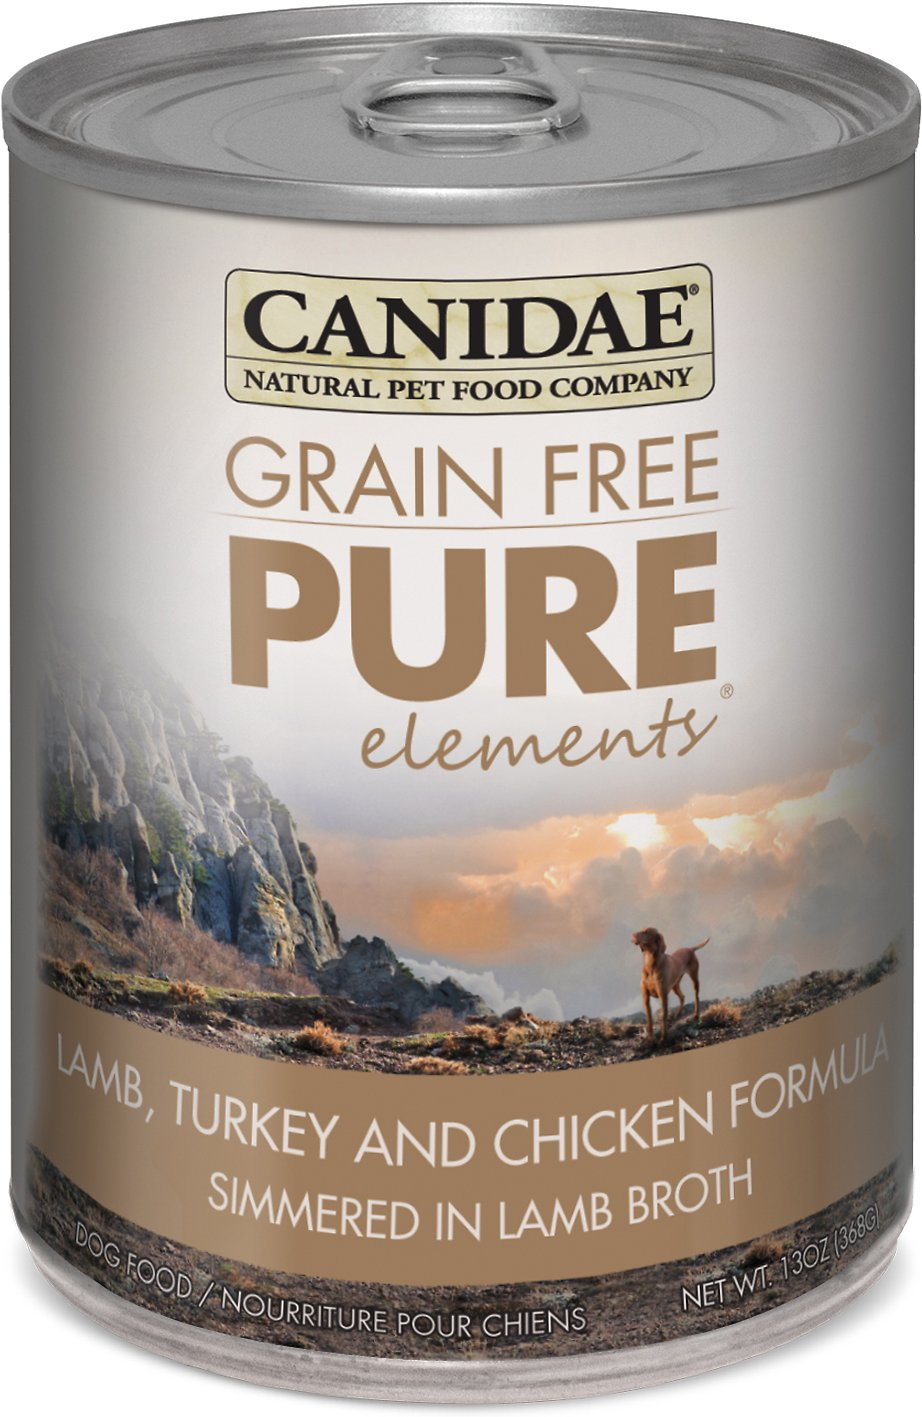 Canidae Grain-Free PURE Elements Lamb, Turkey & Chicken Formula Canned Dog Food, 13-oz